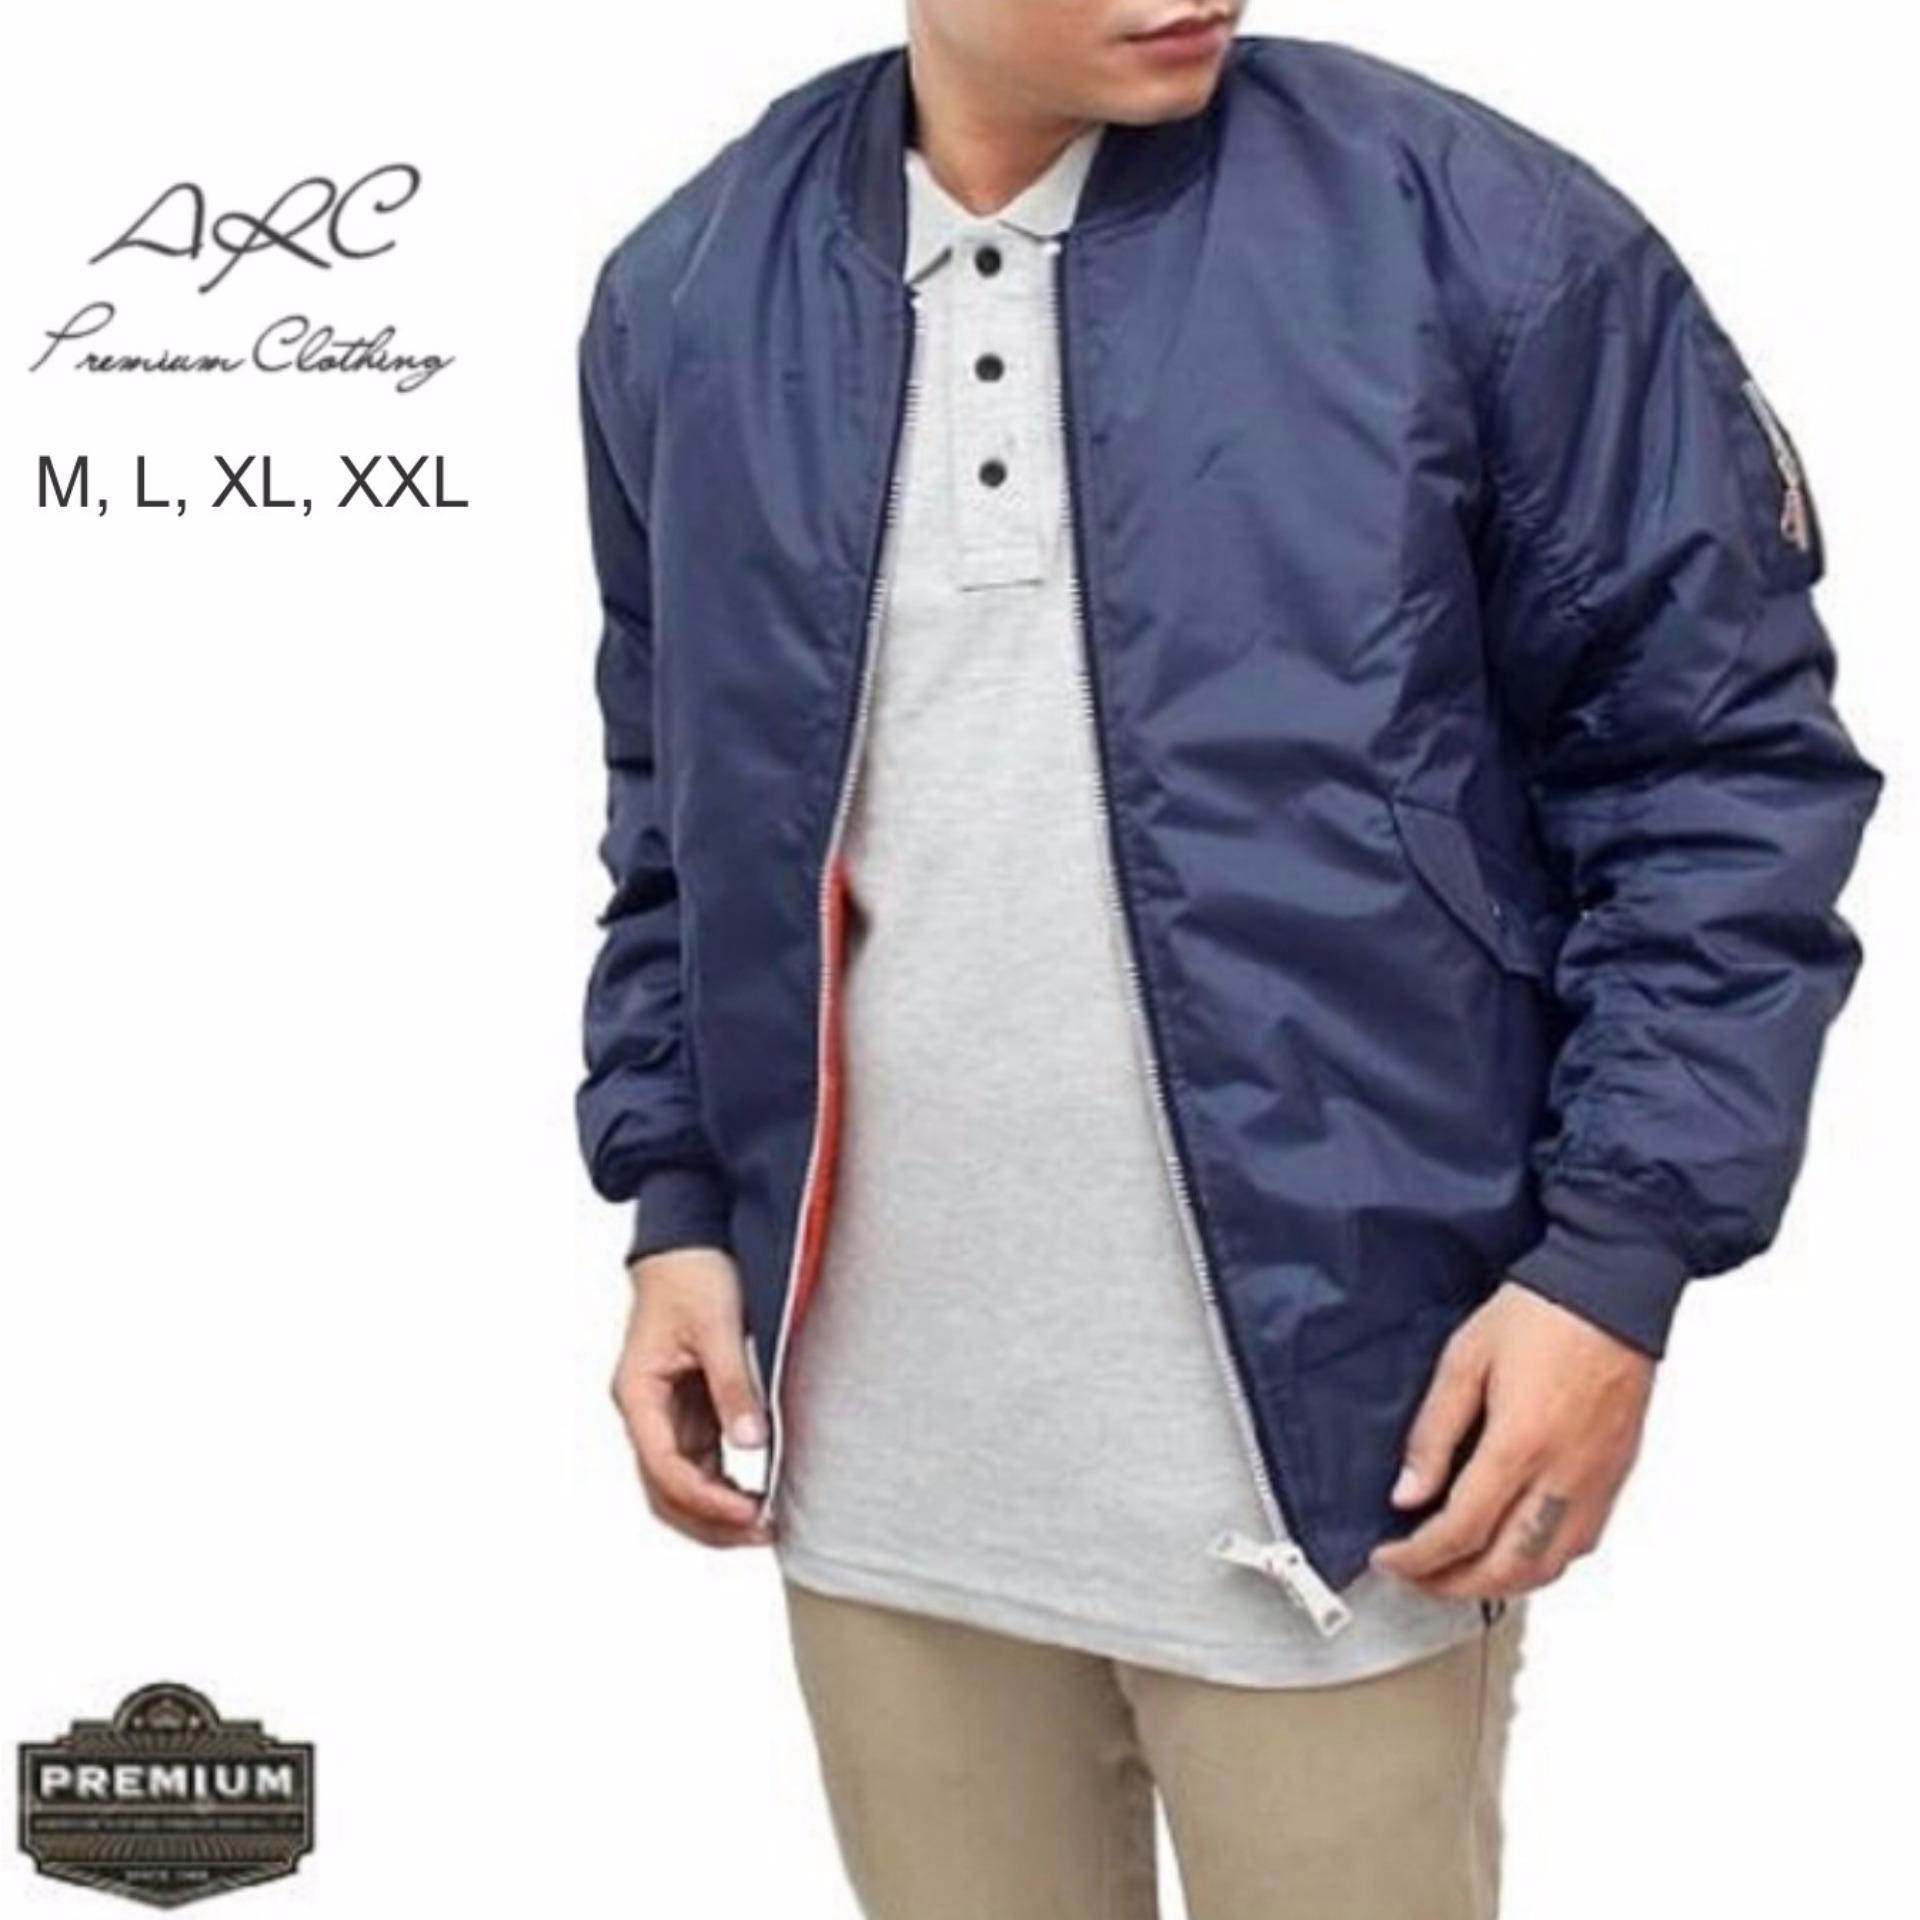 Ax003 Jual Harga Promo Berbagai Produk Terbaru Erigo Tshirt Just Surf Blue Unisex Biru Muda Xl Best Seller Arc Jaket Bomber Pria Navy Murah